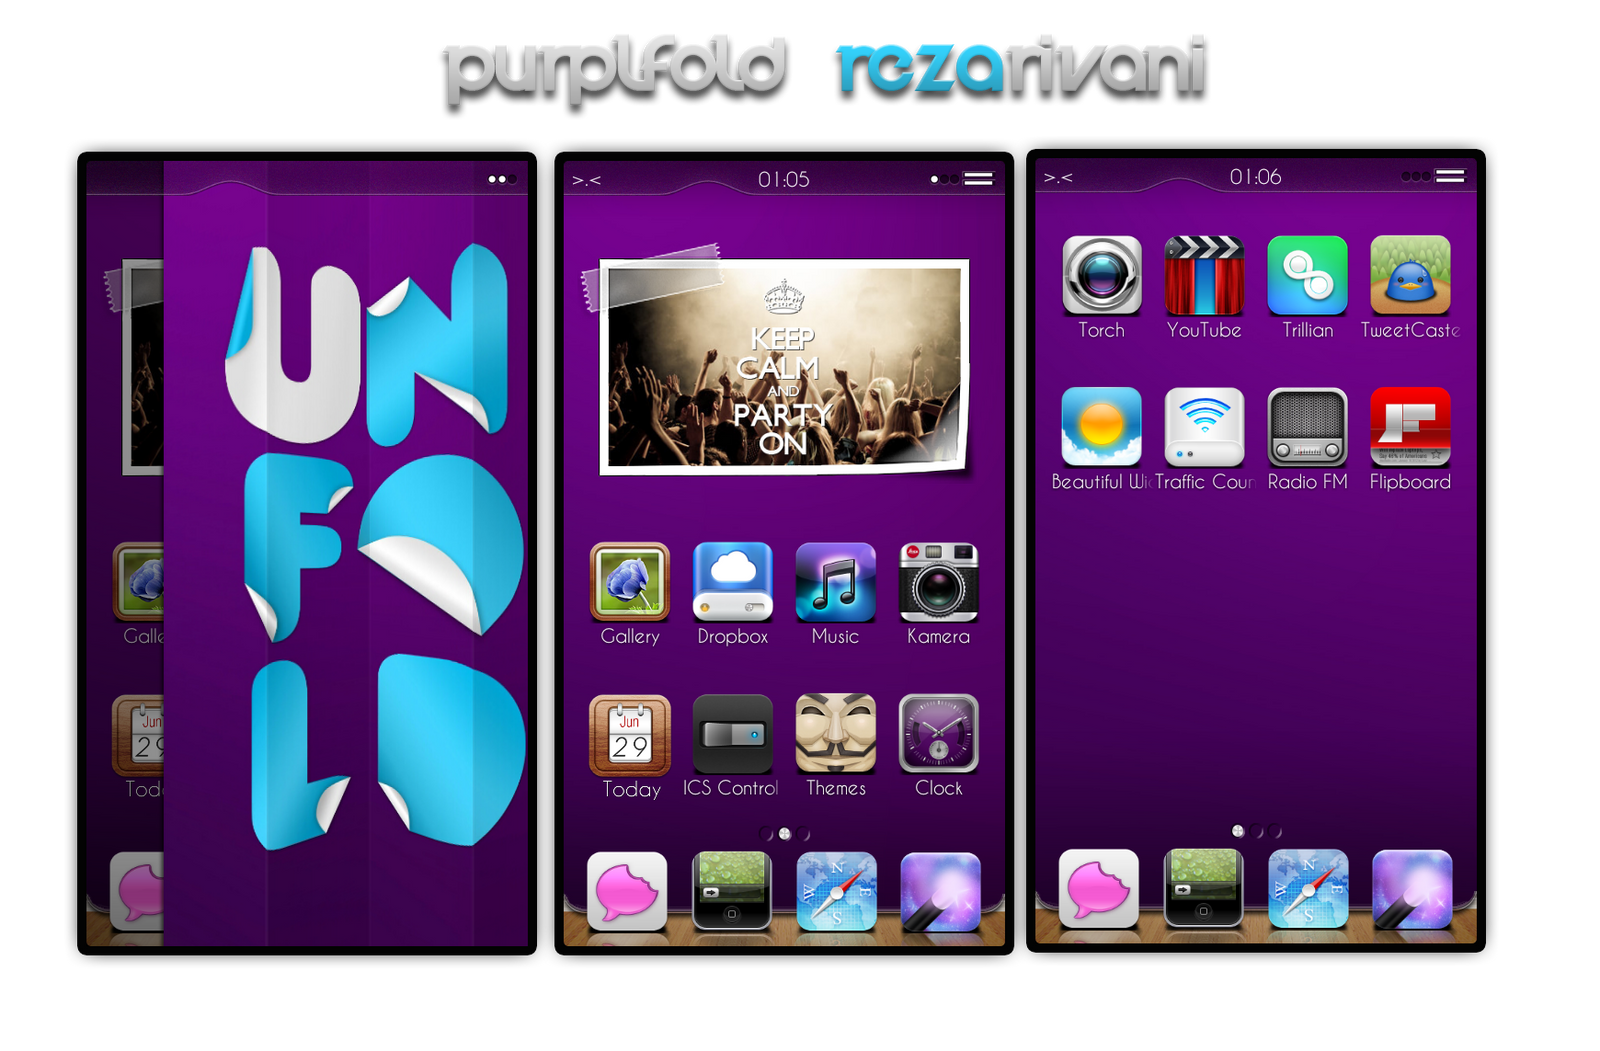 purplFold by rezarivani